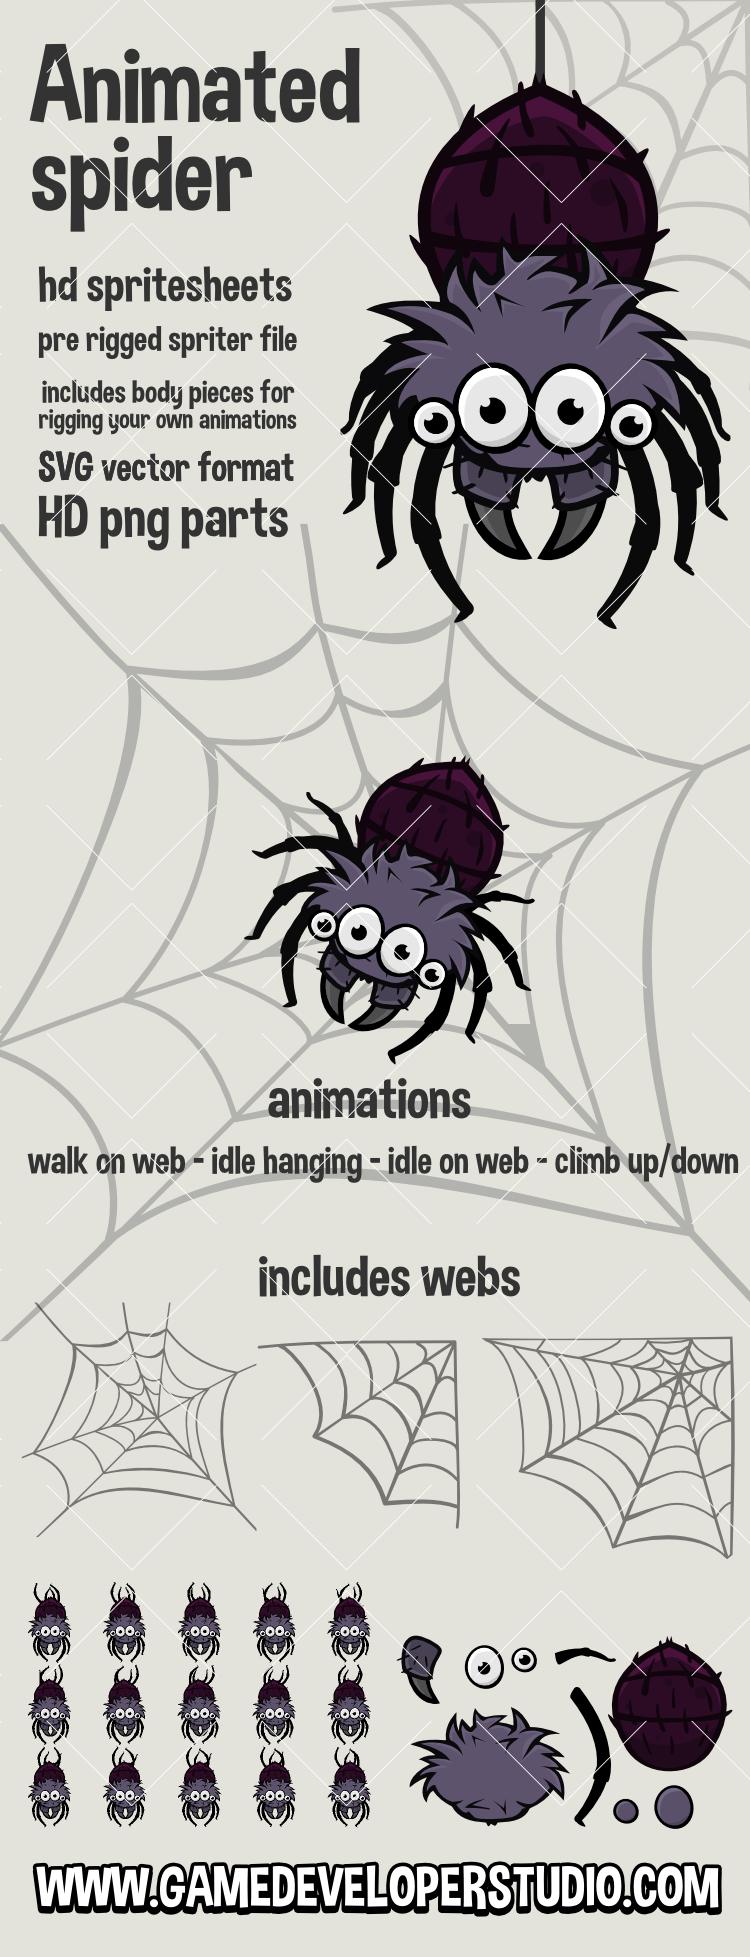 Animated spider game sprite